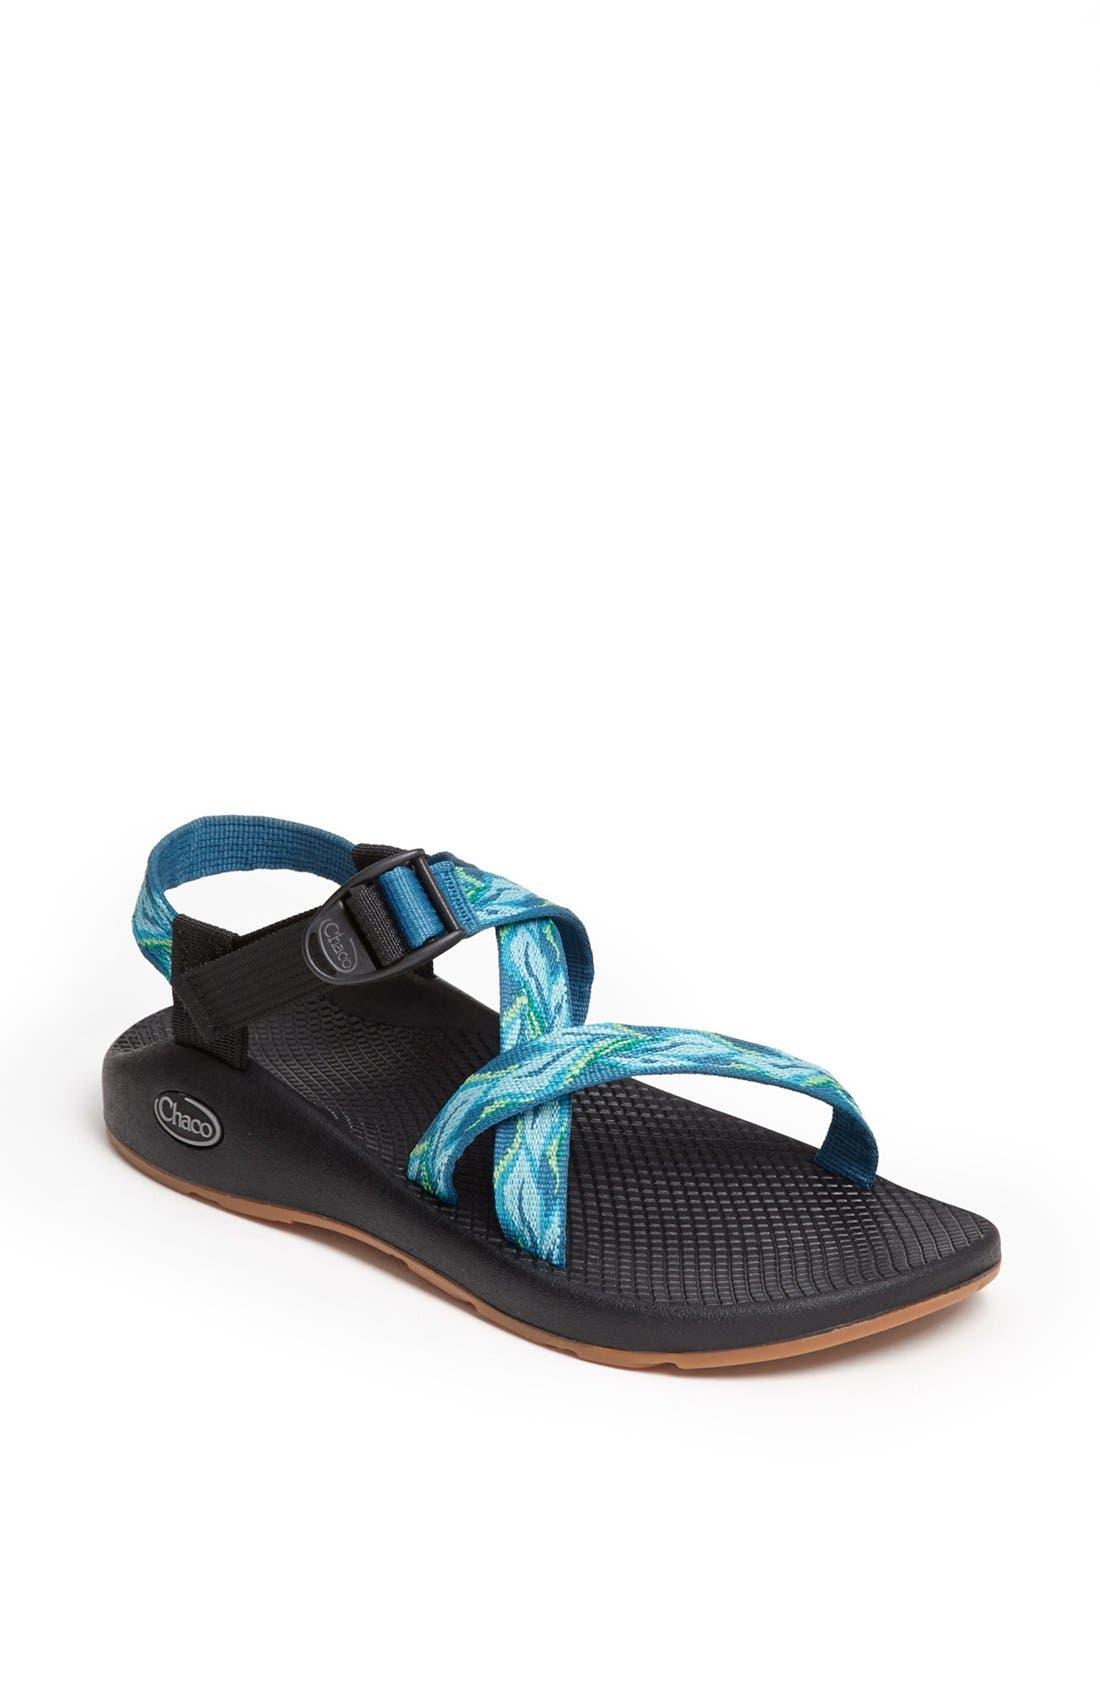 Main Image - Chaco 'Z1 Yampa' Sandal